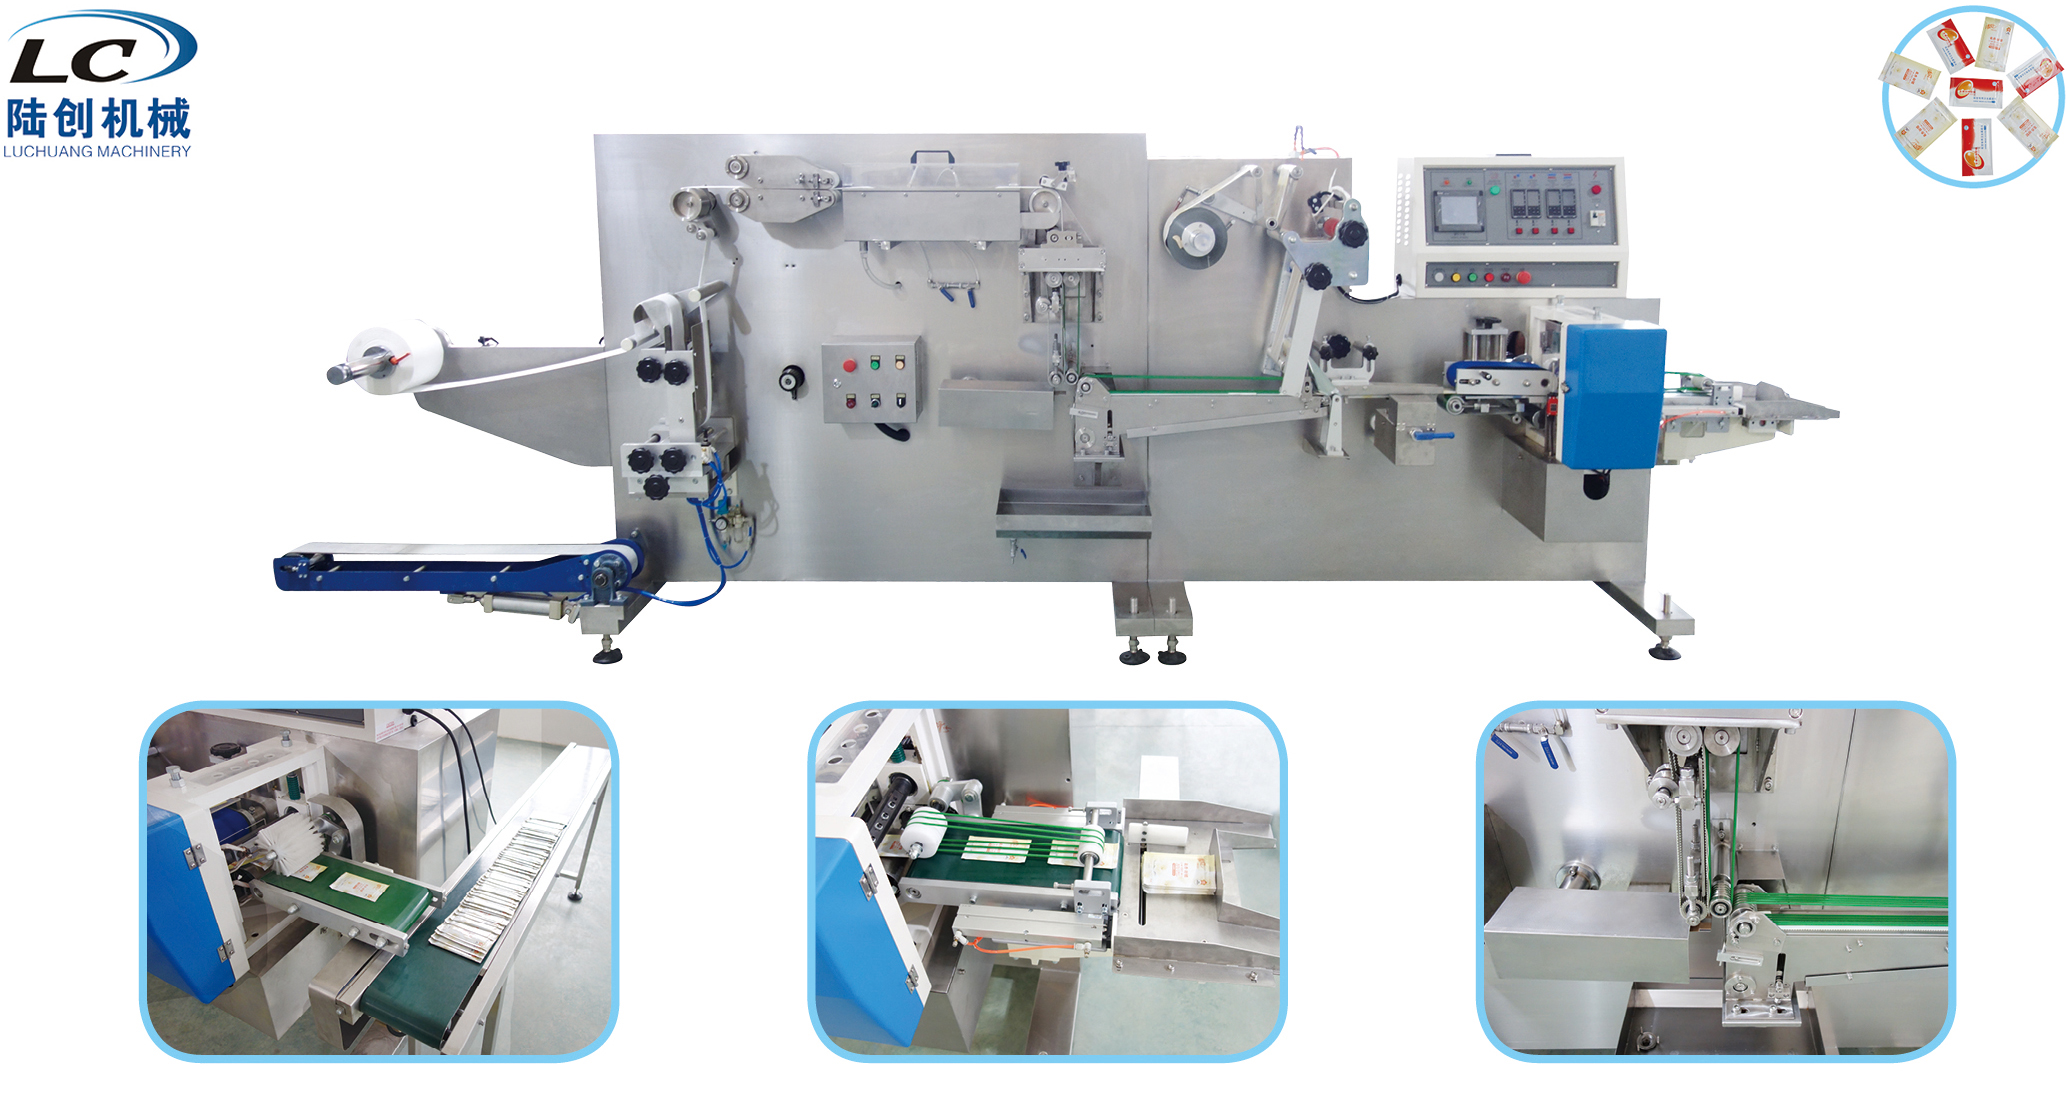 LC-SL01单片湿巾生产线